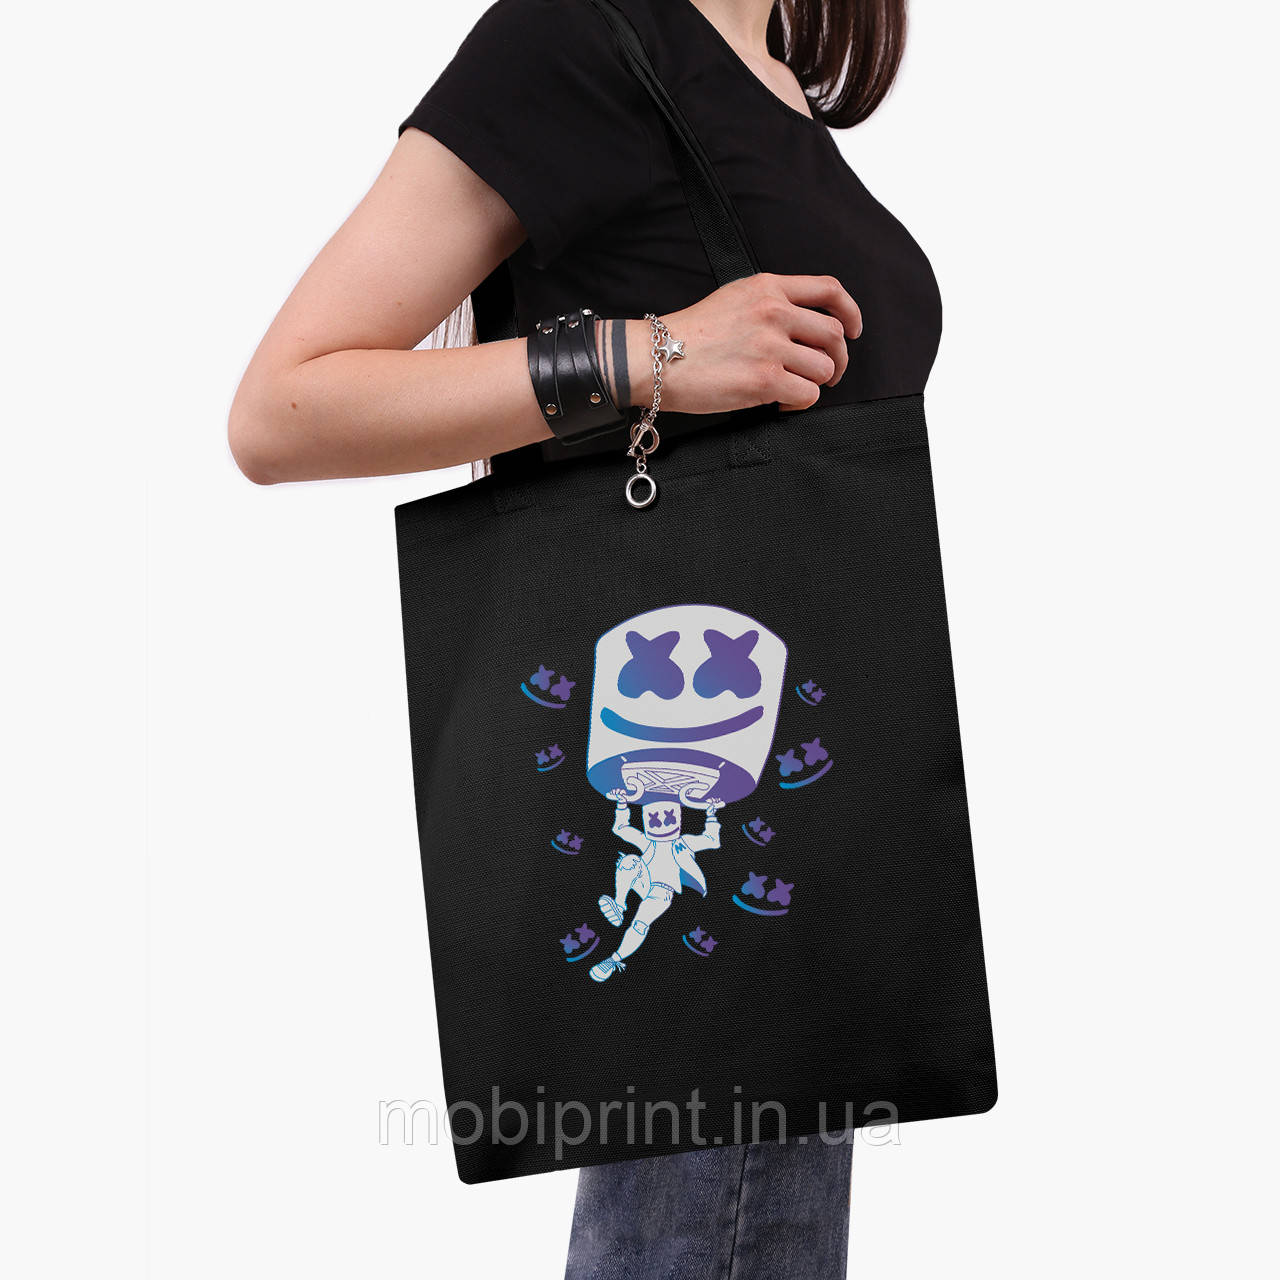 Эко сумка шоппер черная Маршмелло Фортнайт (Marshmello Fortnite) (9227-1329-2)  экосумка шопер 41*35 см